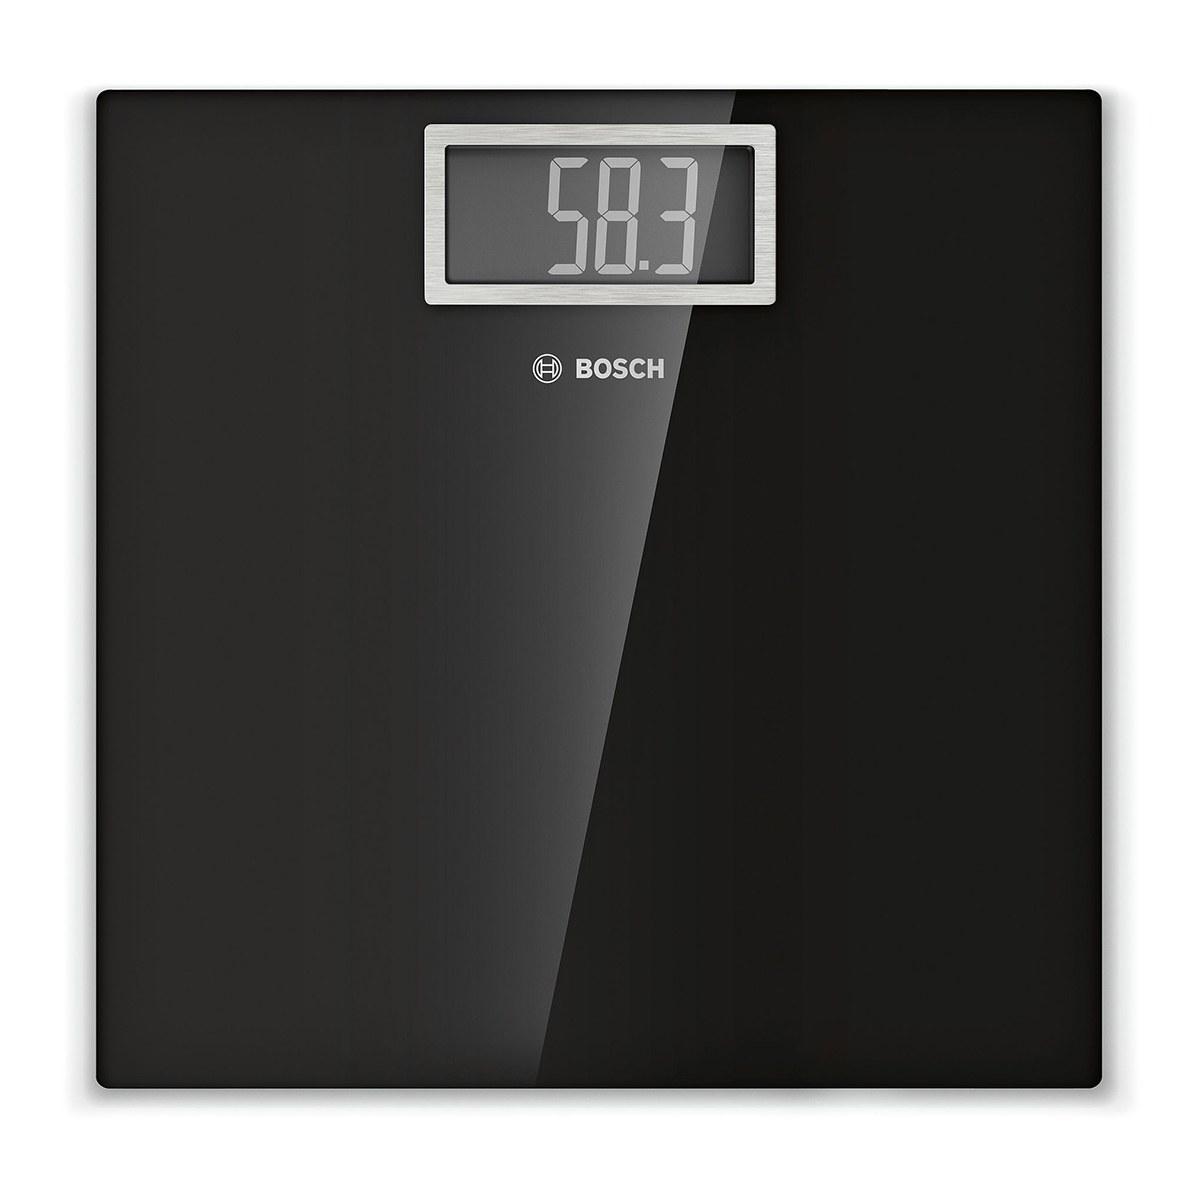 main images ترازو بوش مدل PPW3401 Bosch digital scale model PPW3401